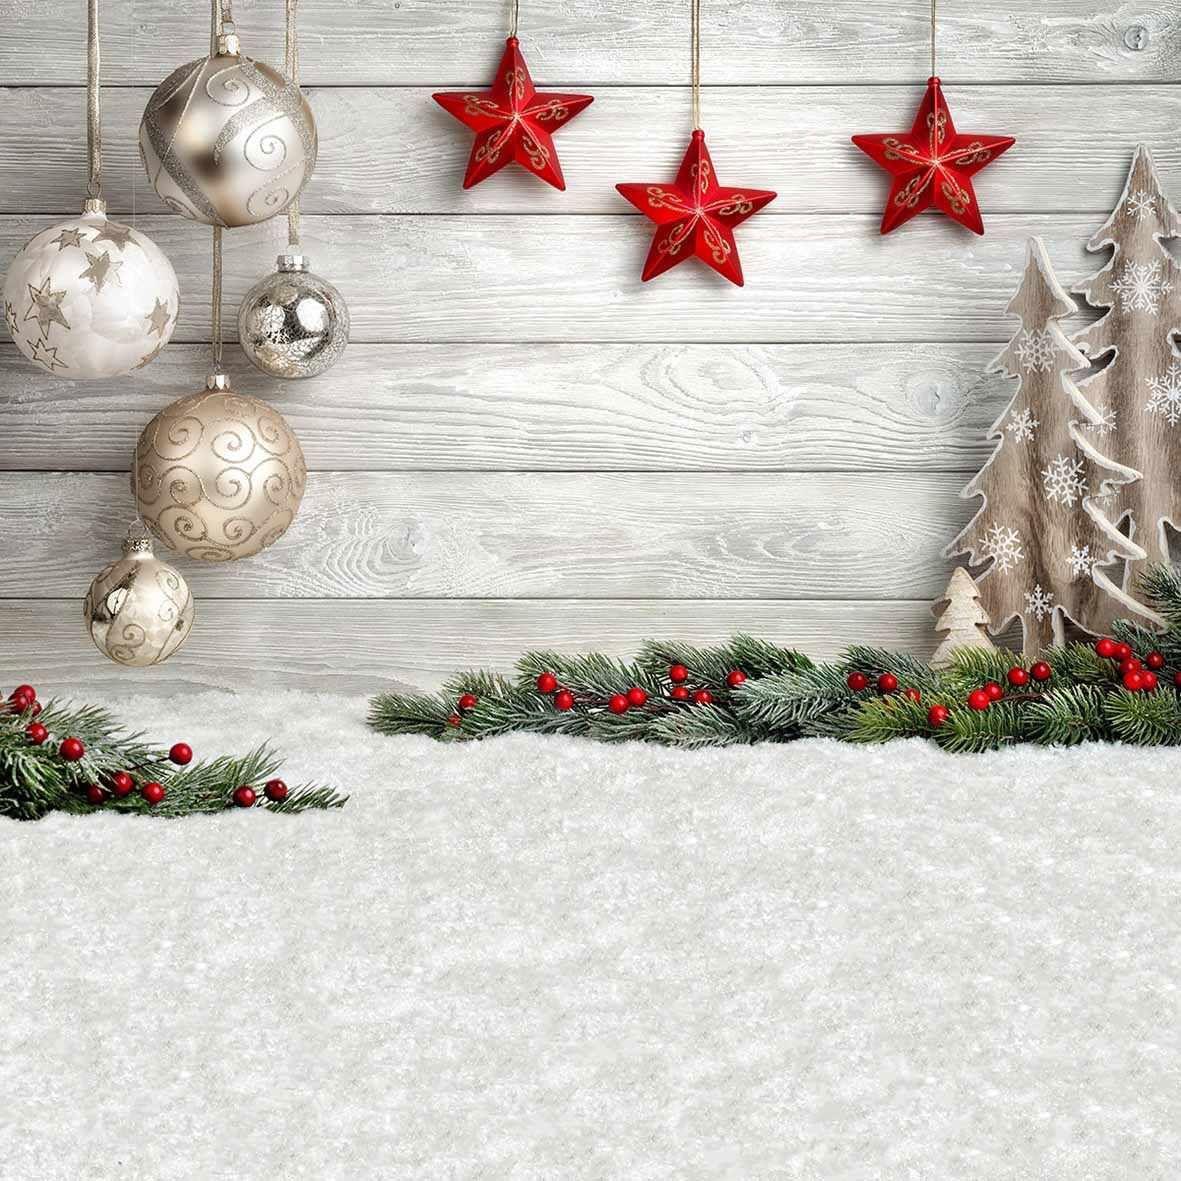 13 Amazing Christmas Background Ideas #christmasbackgrounds 13 Amazing Christmas Background Ideas  Allenjoy Christmas Background Photography Ball Stars Child White Wooden Tree Decoration Photographic Photocall Navi #christmasbackgrounds